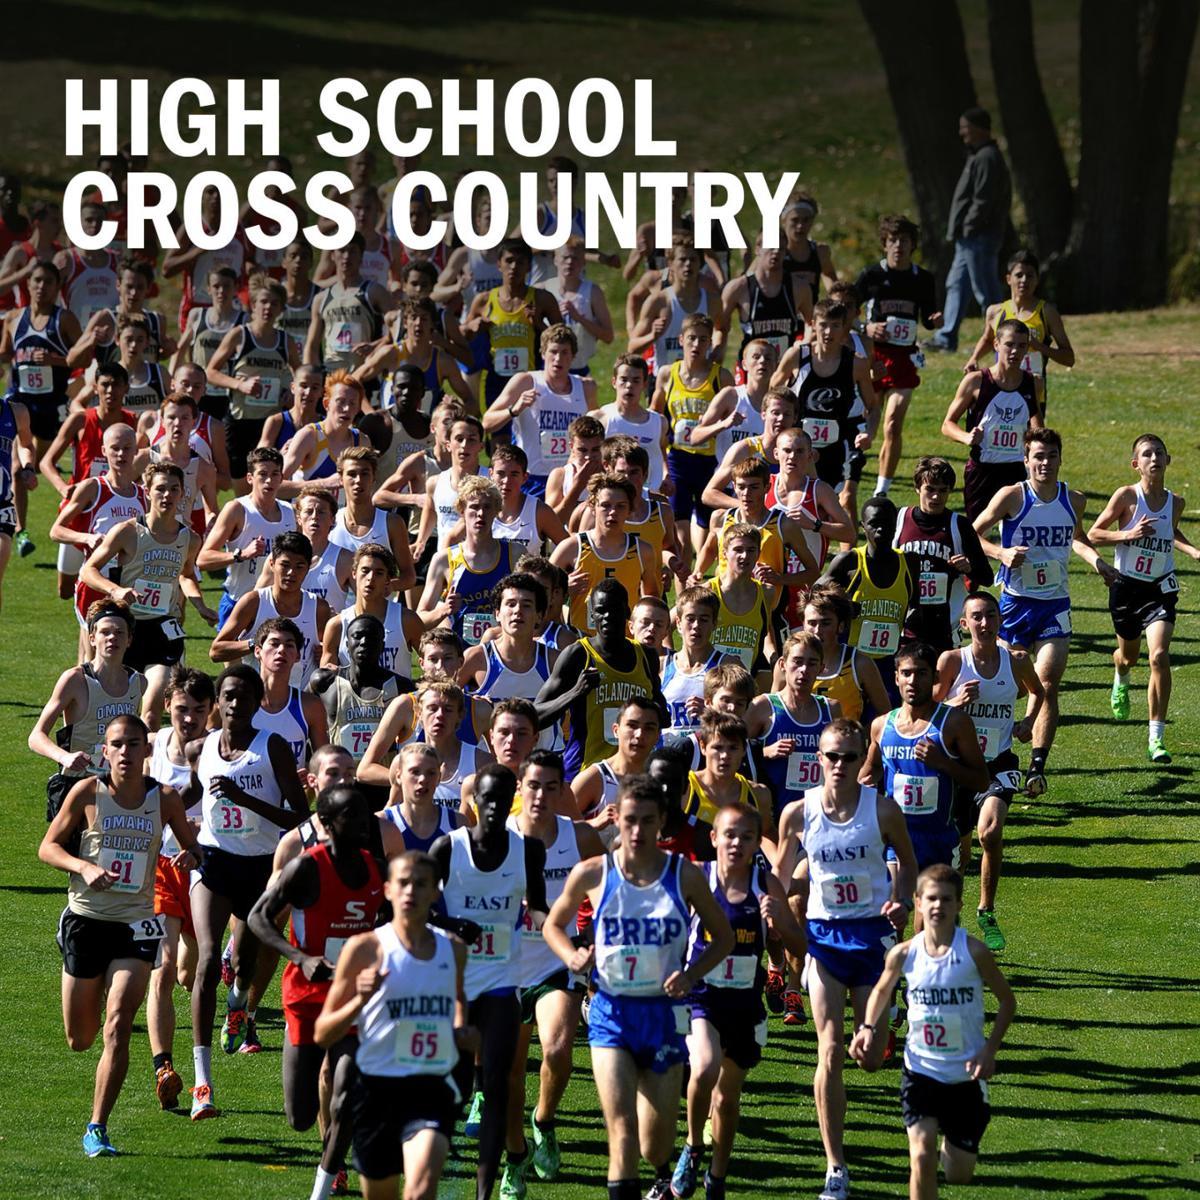 High school cross country logo 2014